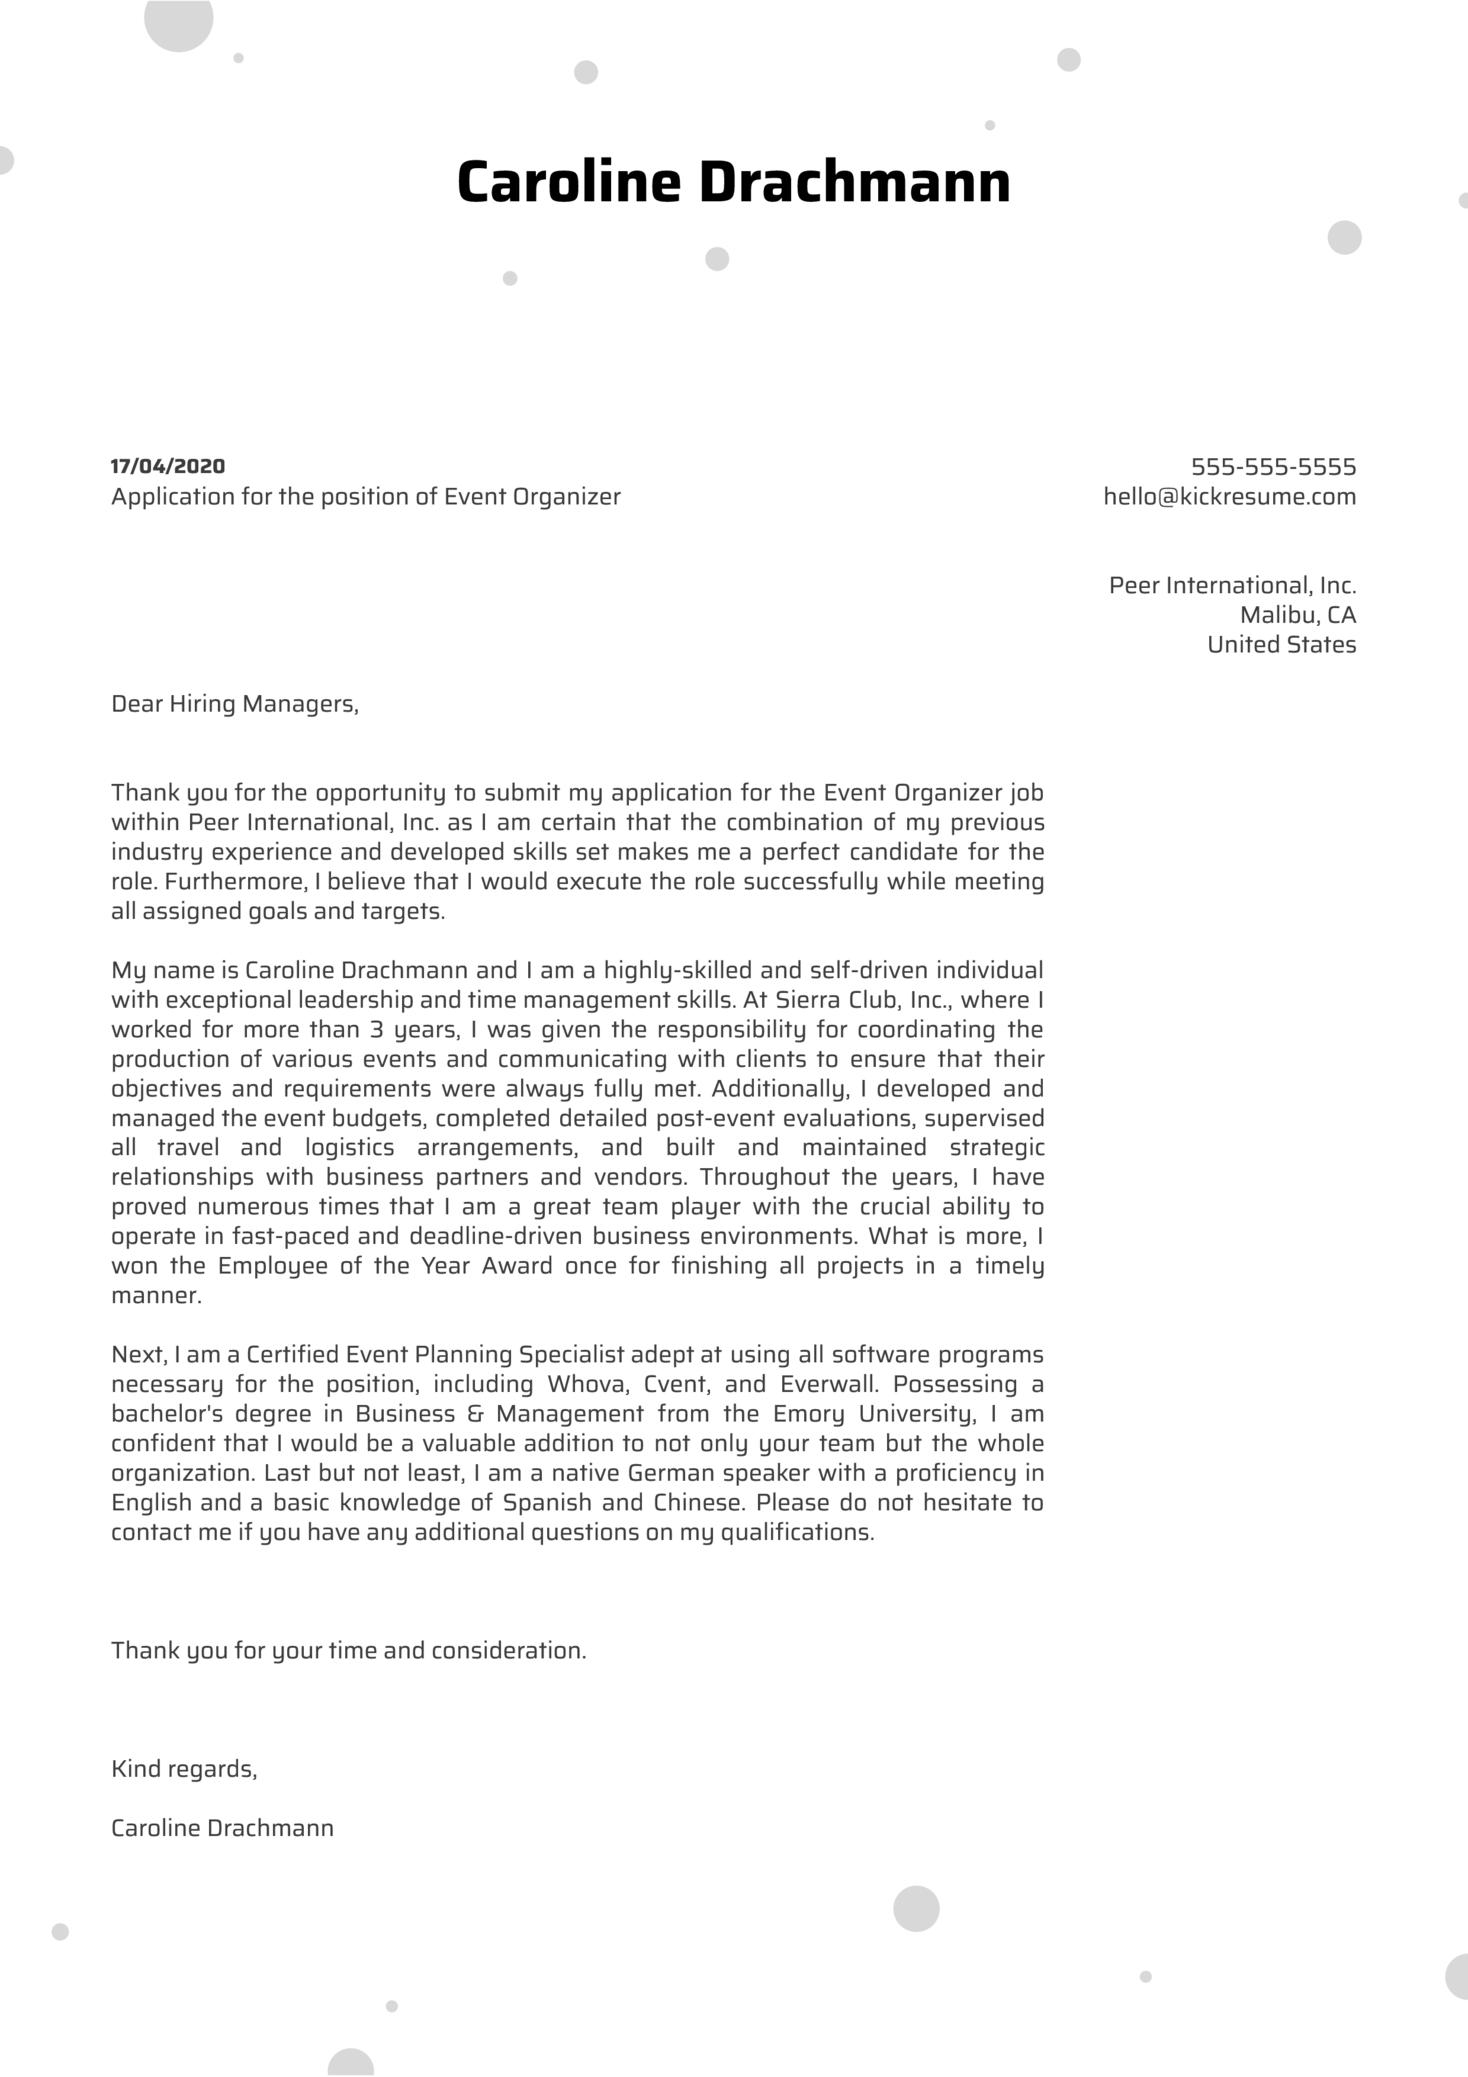 Event Organizer Cover Letter Sample